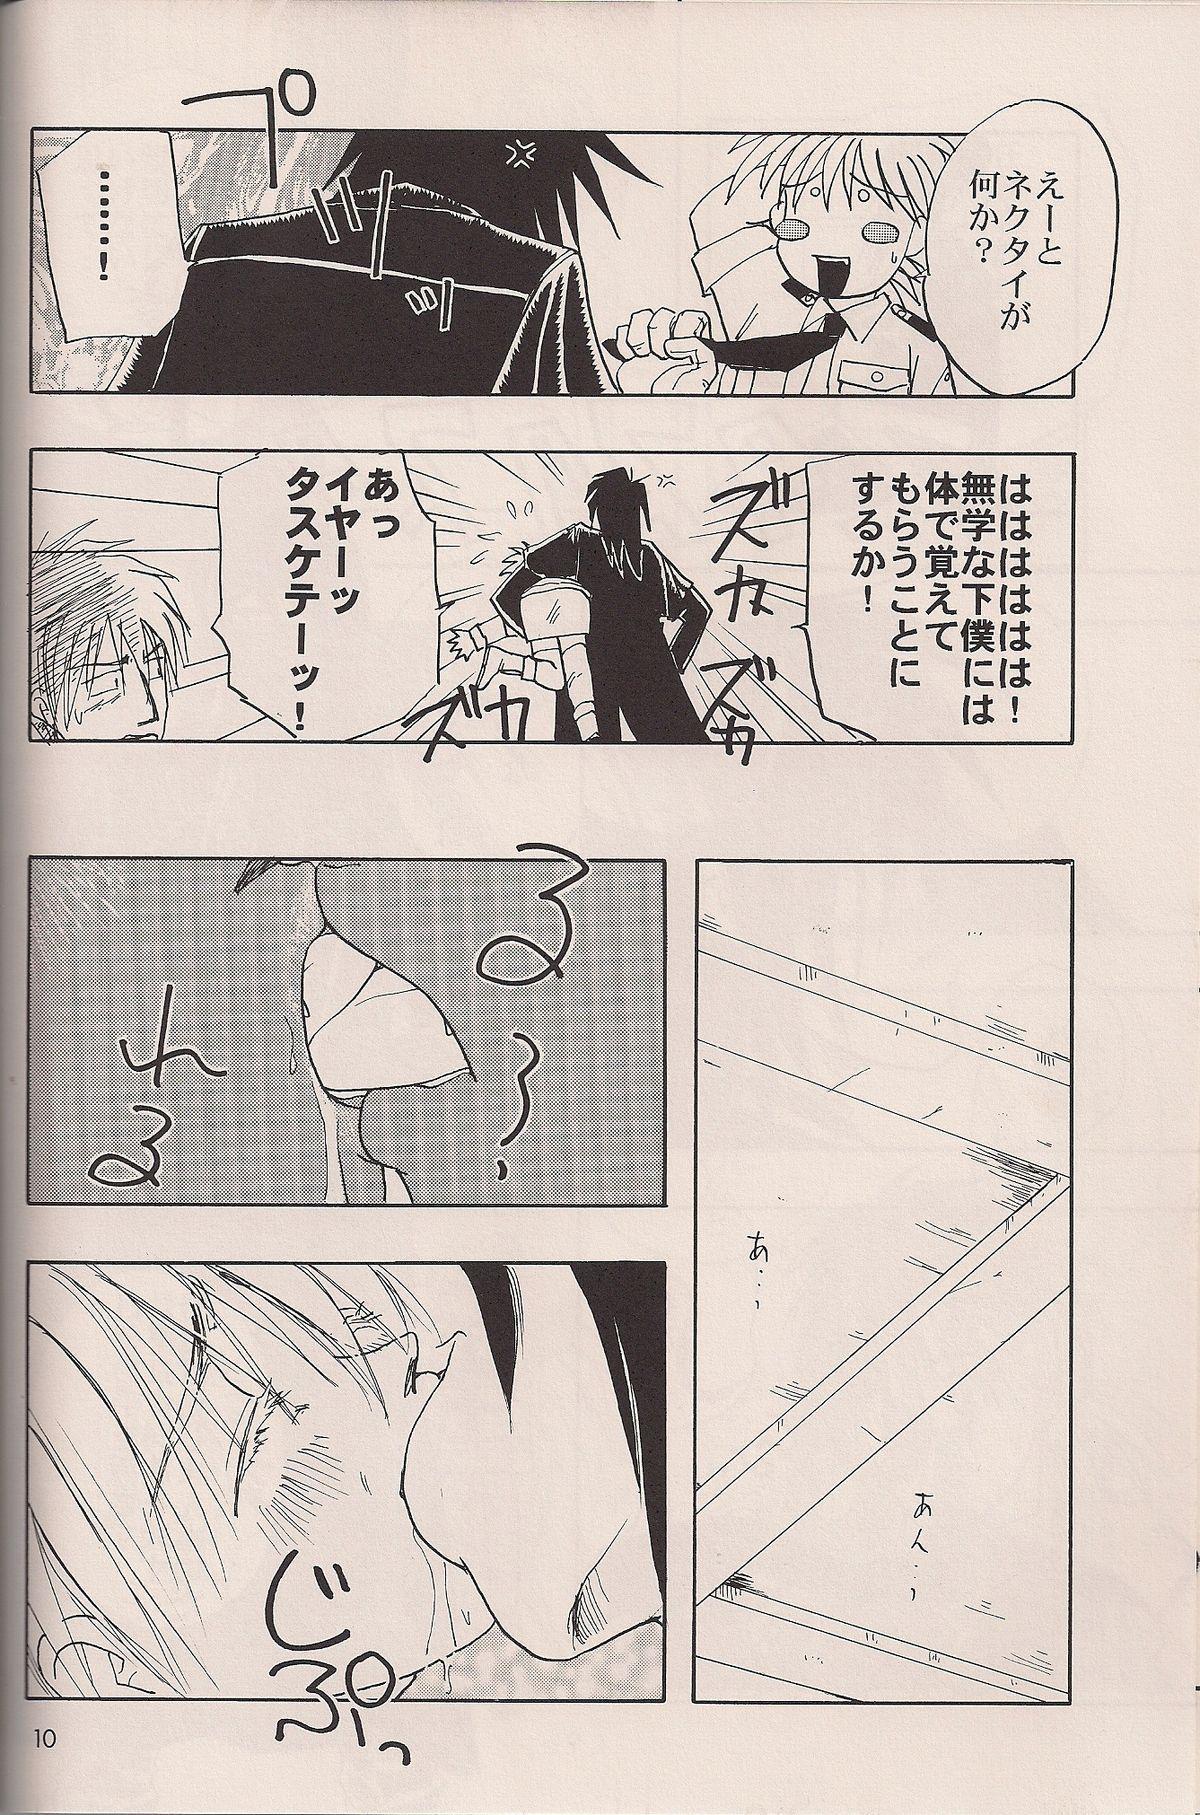 Enzai no Kiroku 8